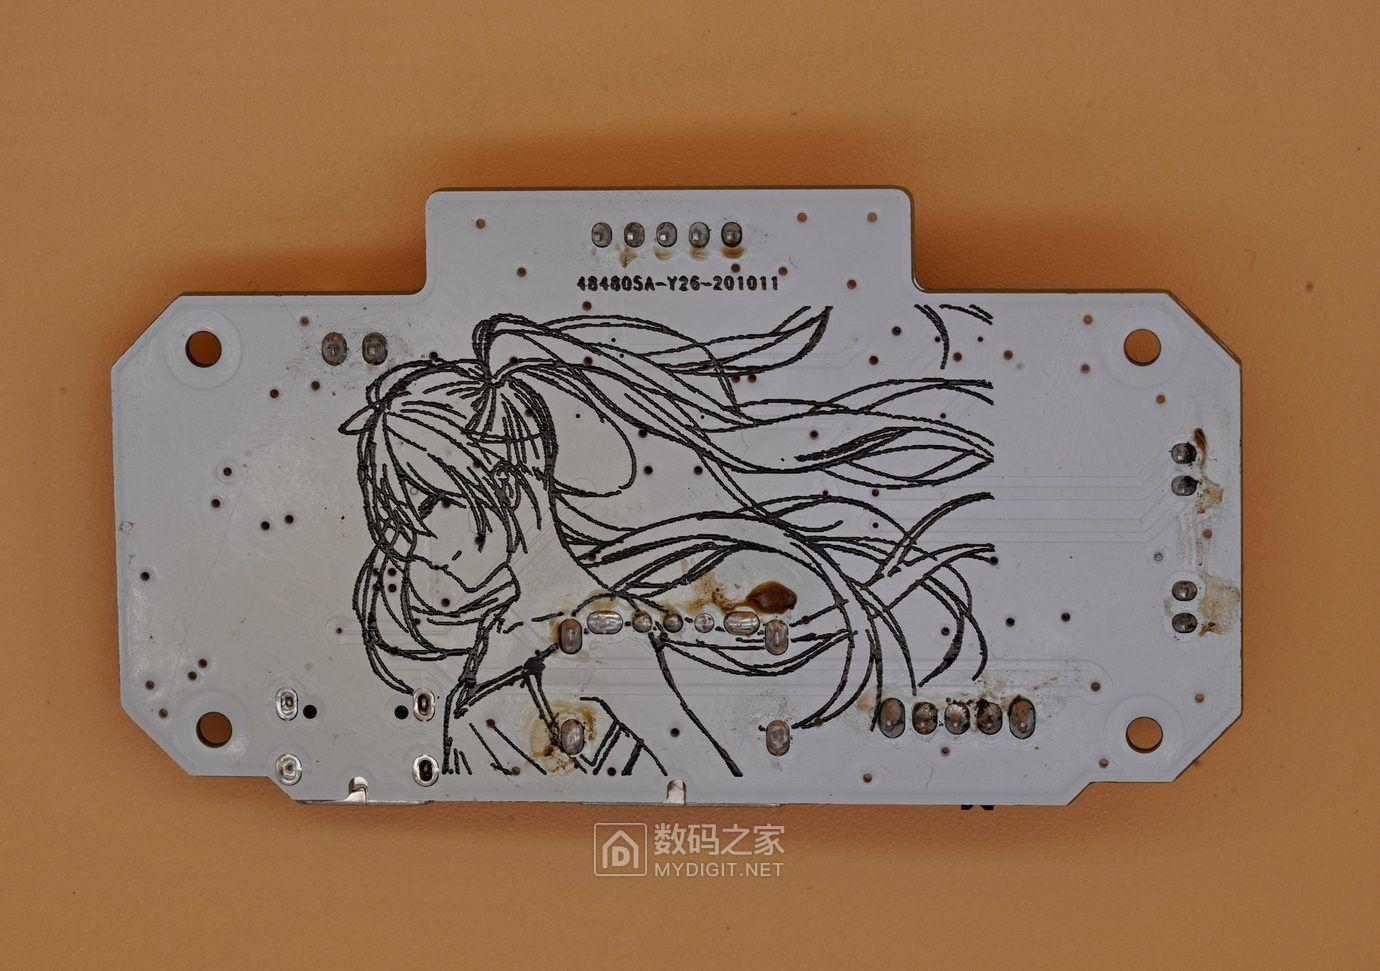 DSC06464.JPG